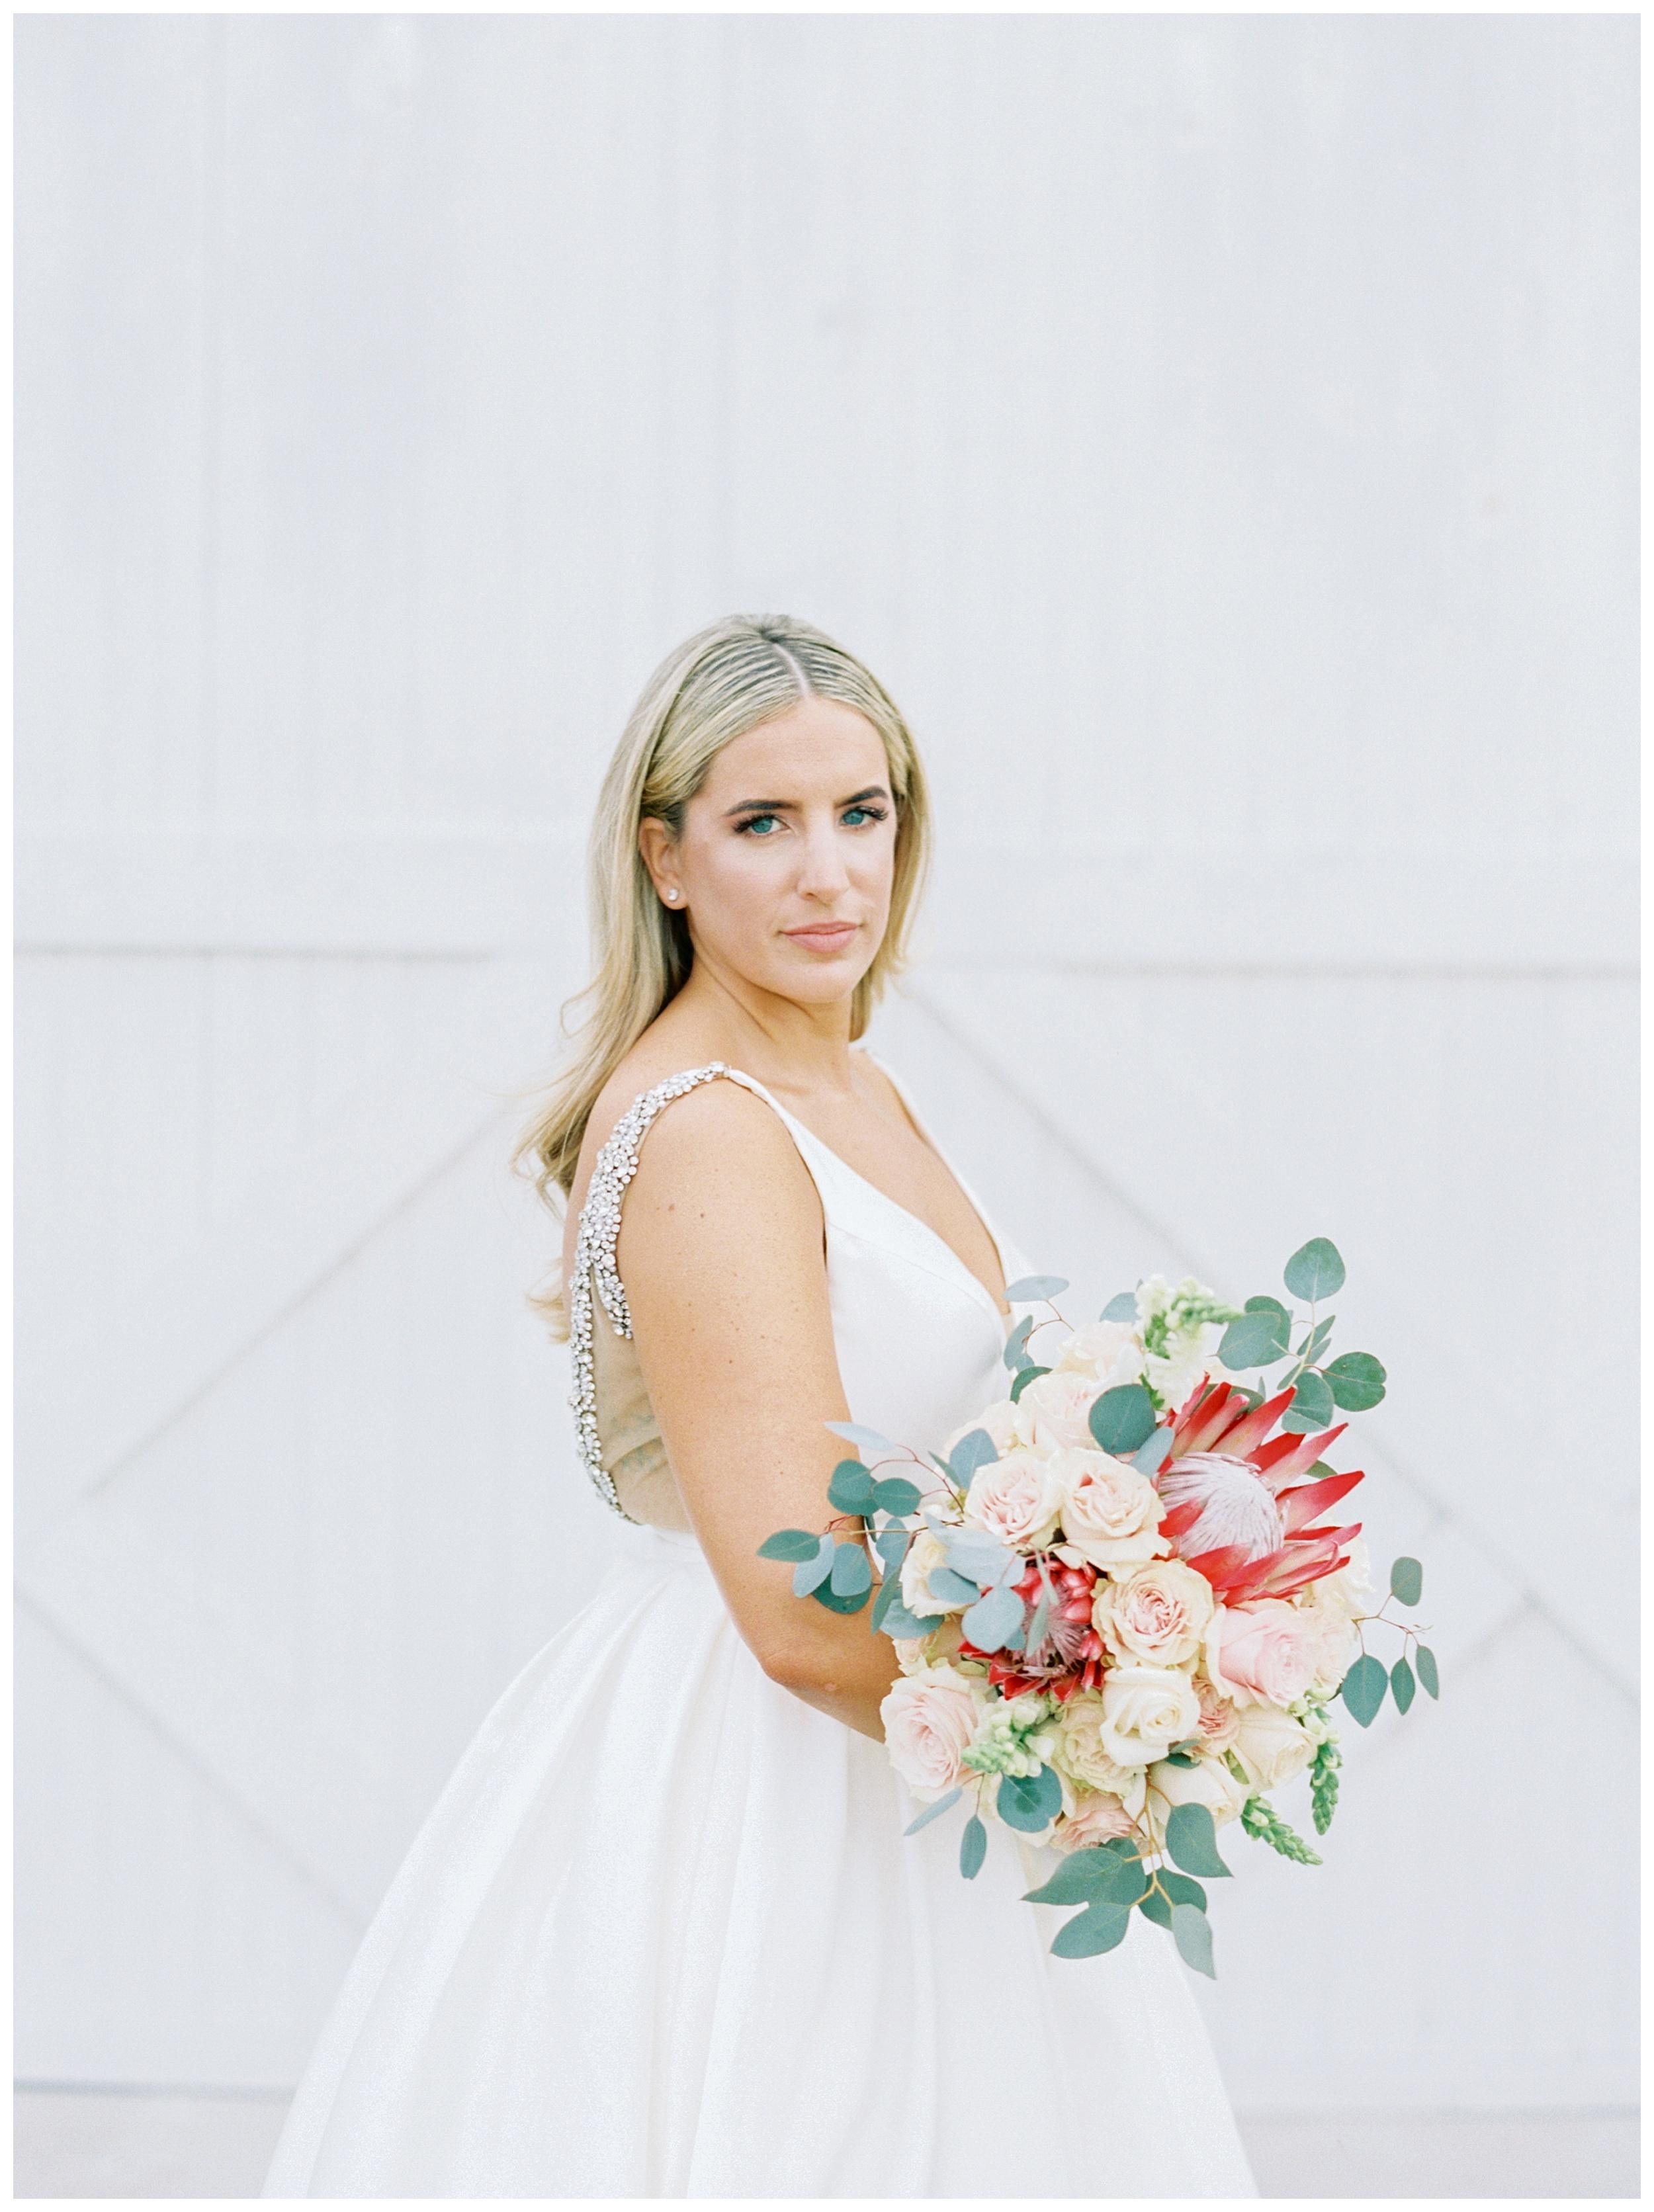 South Florida Wedding Photographer Kir Tuben_0015.jpg